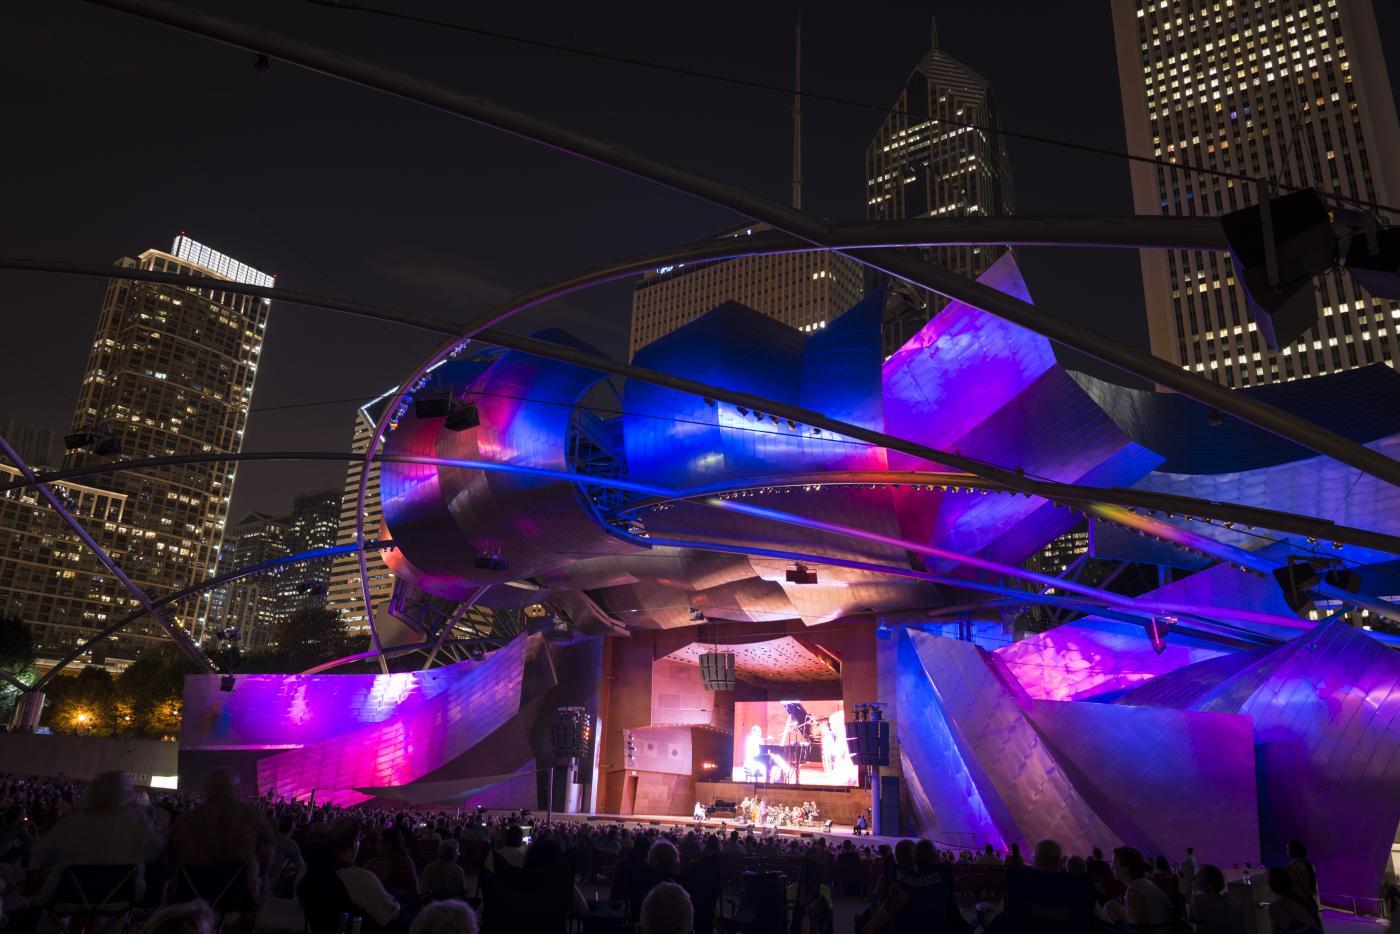 The Chicago Jazz Festival at Millennium Park's Pritzker Pavilion. Photo: Courtesy of City of Chicago